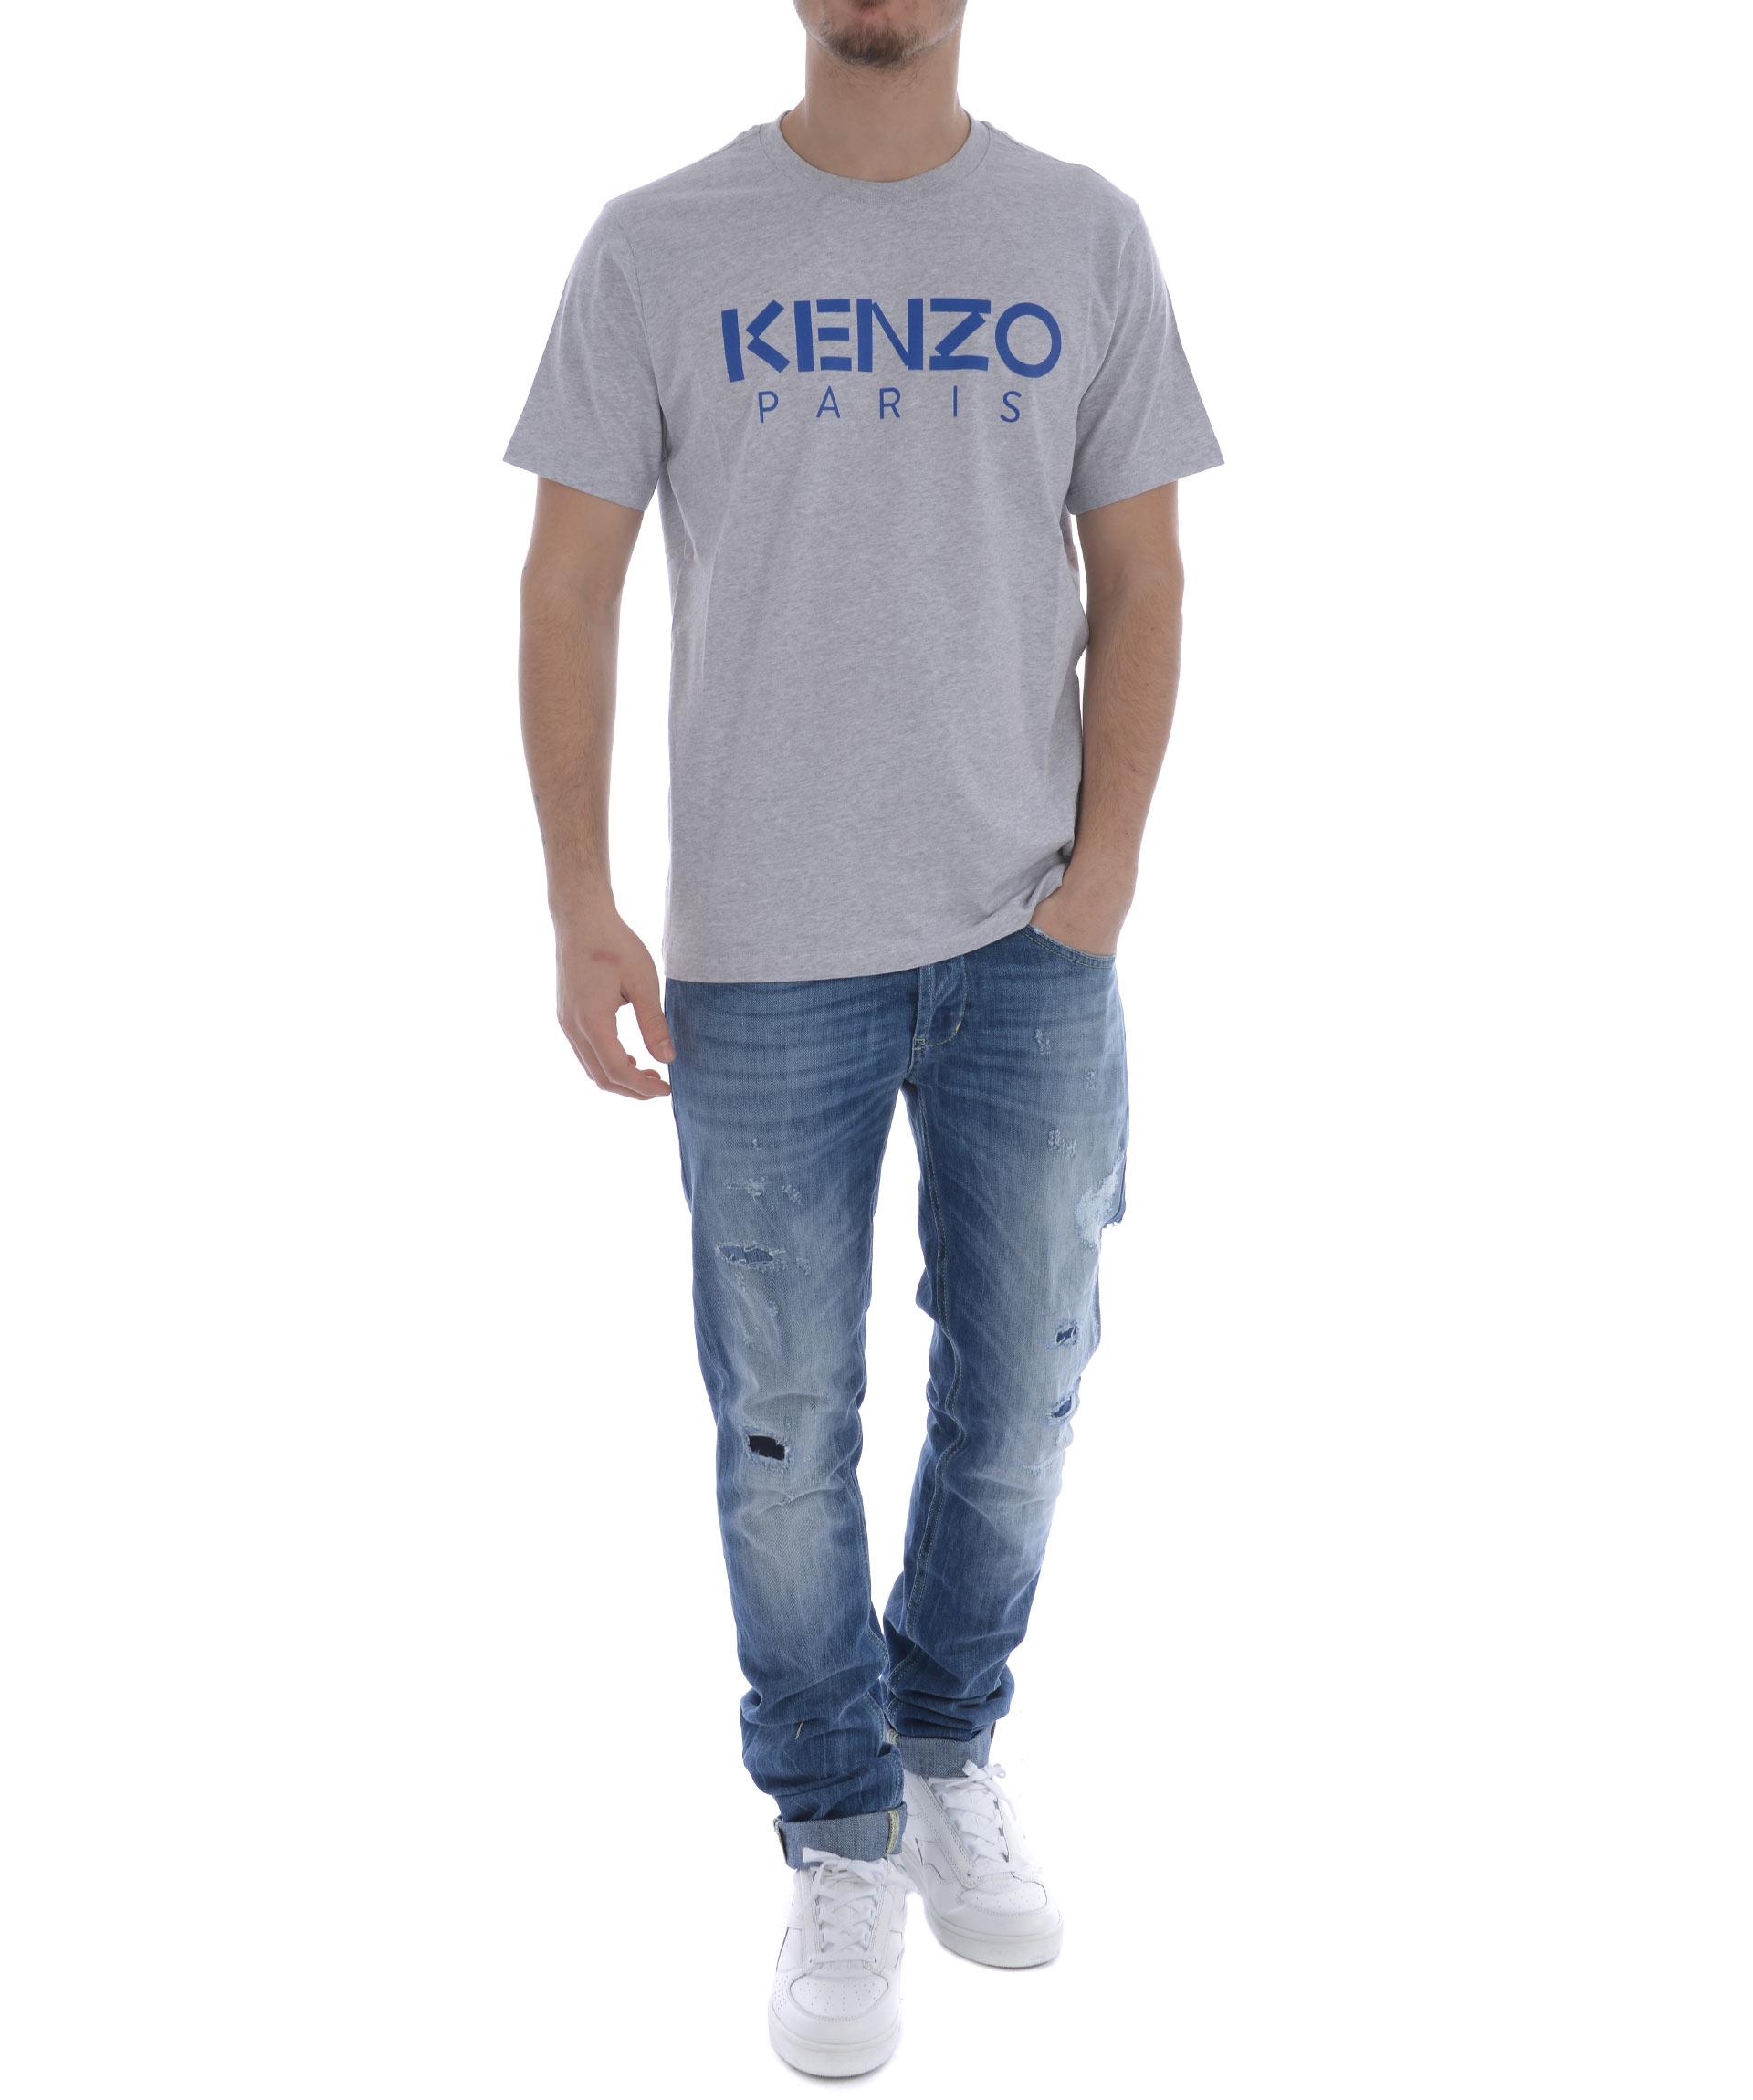 dcf3fa448 T-shirt Kenzo KENZO - KENZO - TufanoModa